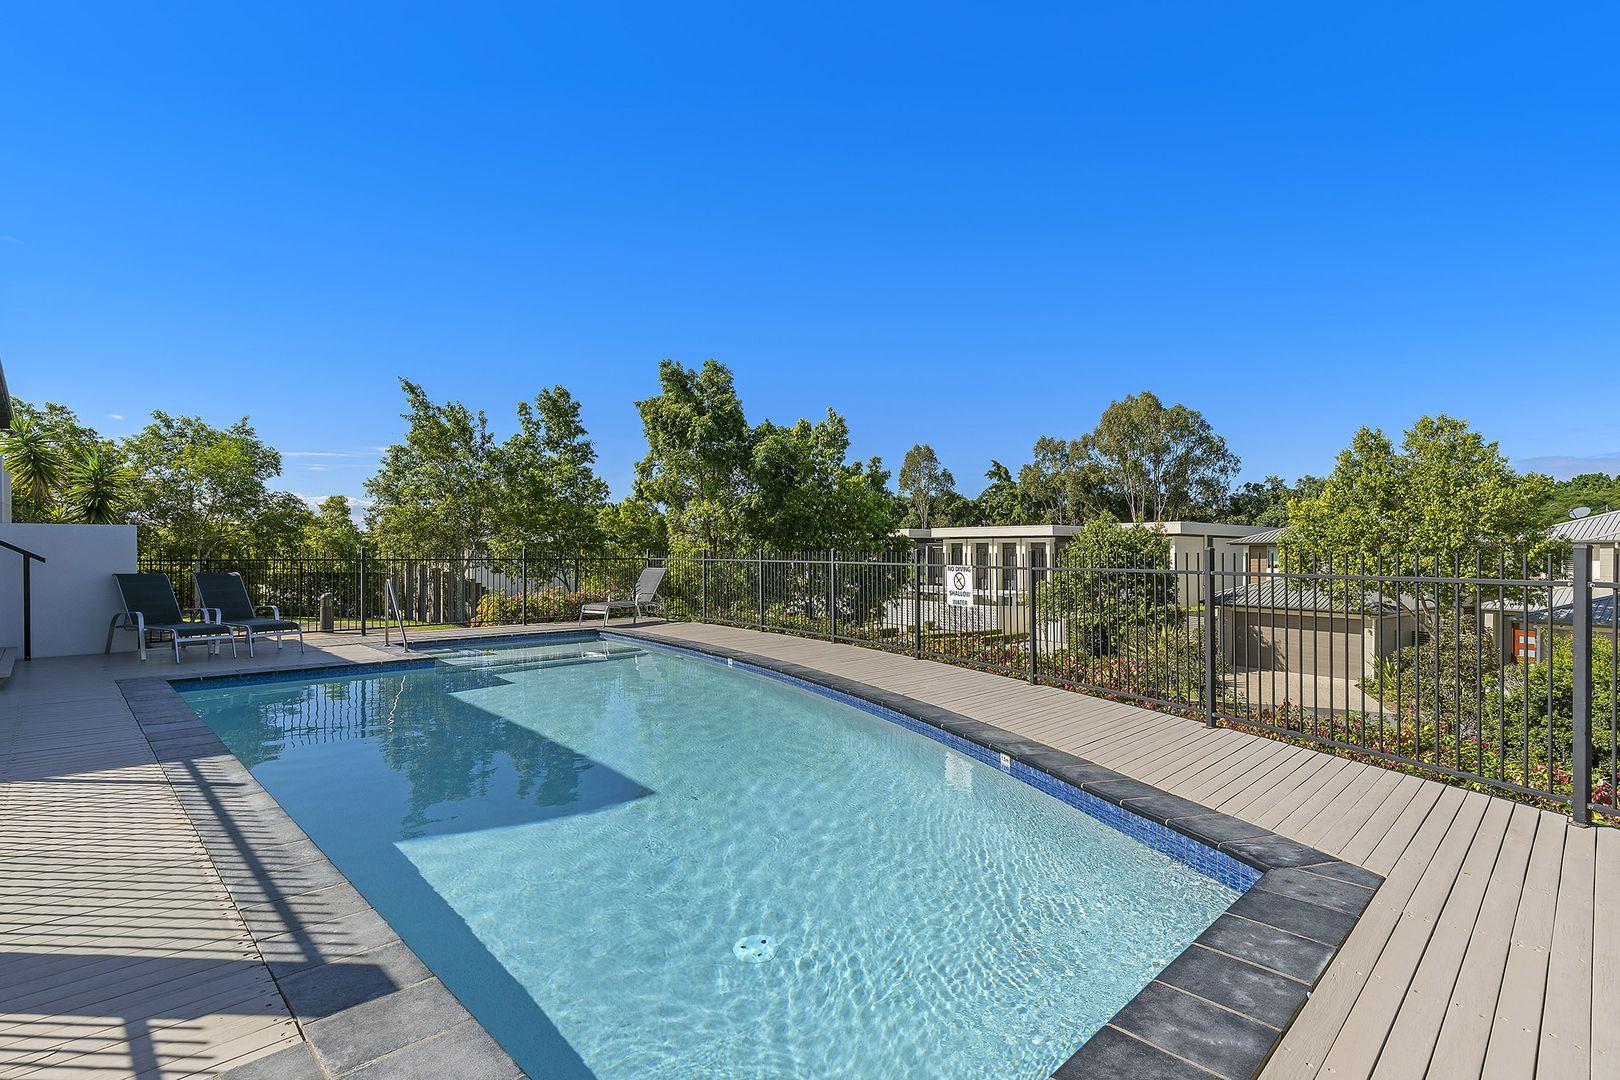 6/501 North Hill Drive, Robina QLD 4226, Image 2